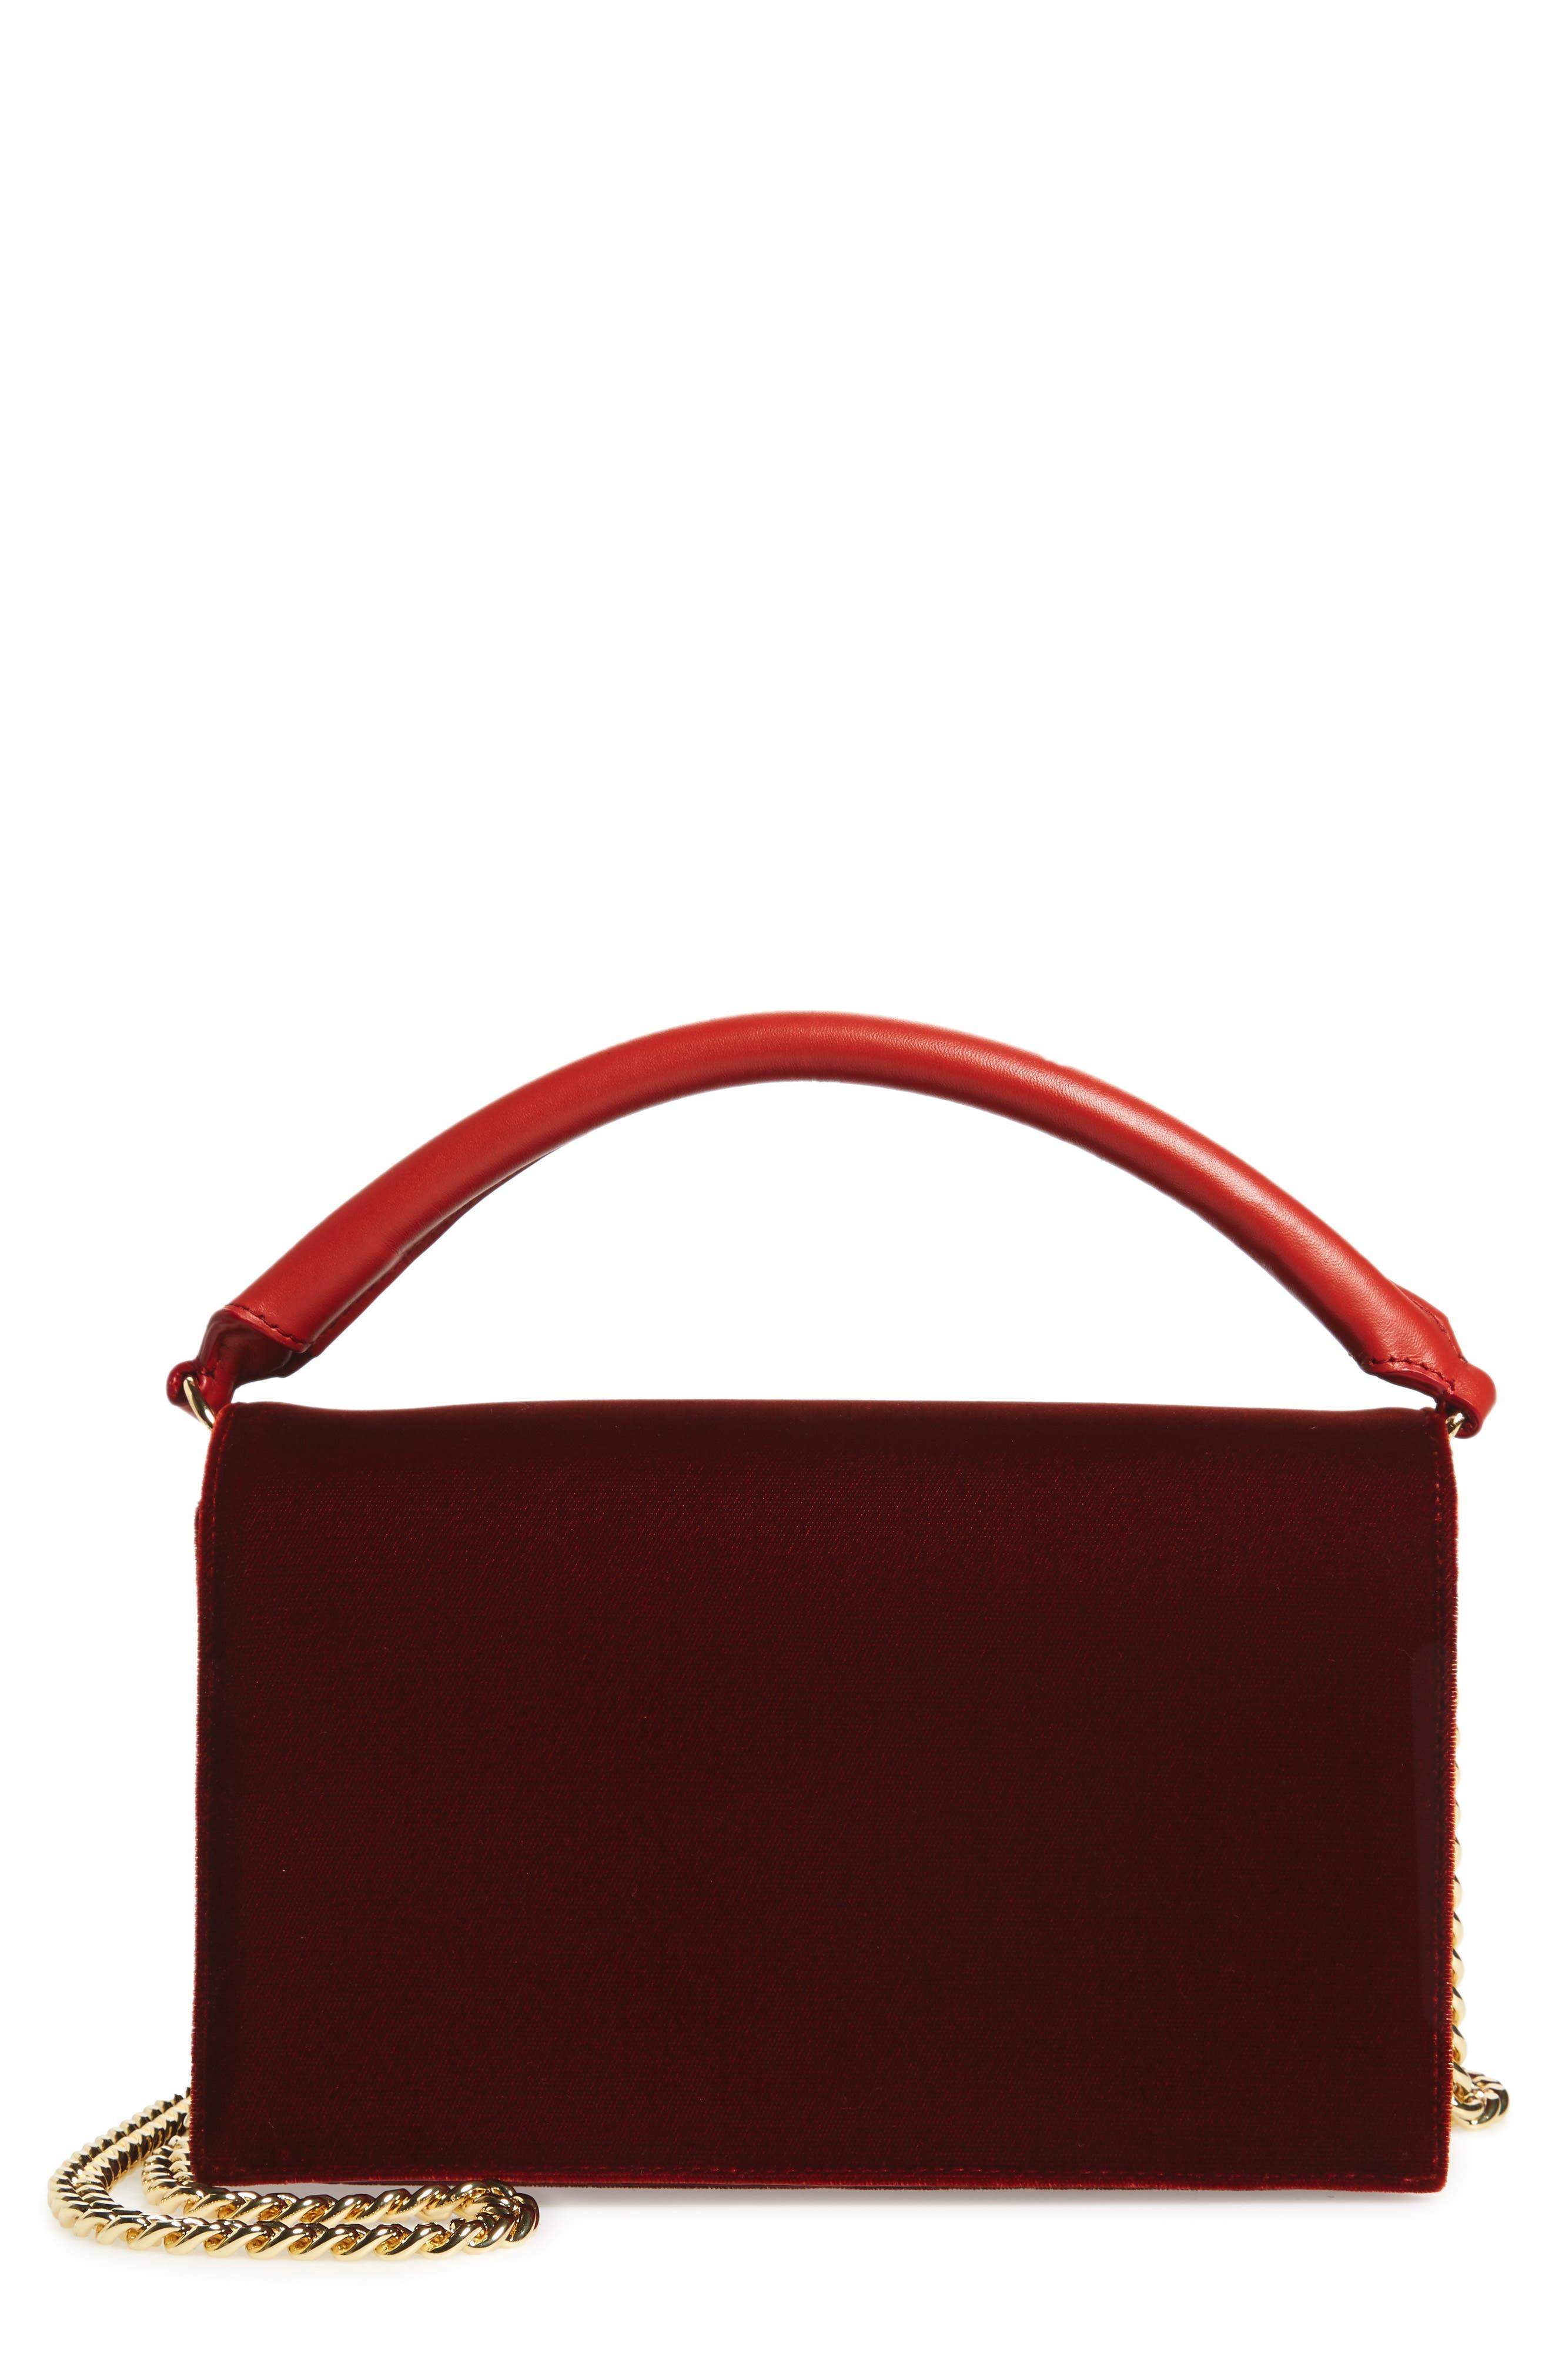 Alternate Image 1 Selected - Diane von Furstenberg Soirée Velvet Top Handle Bag